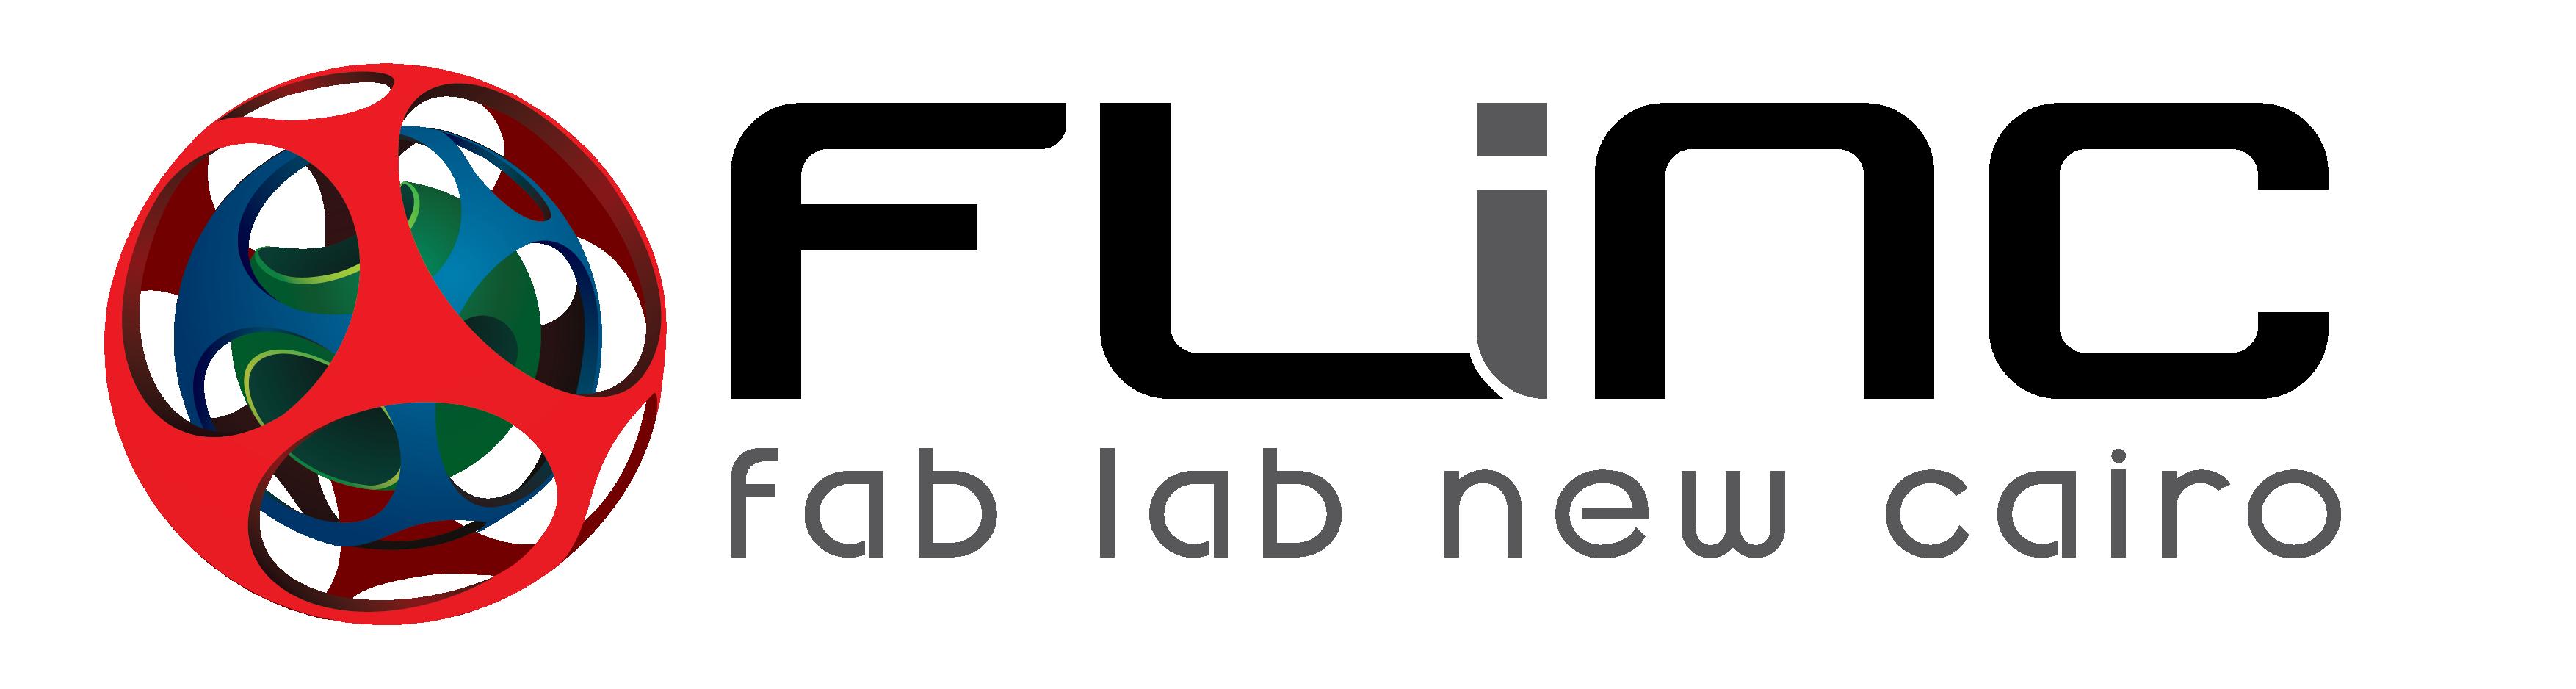 FabLab New Cairo logo